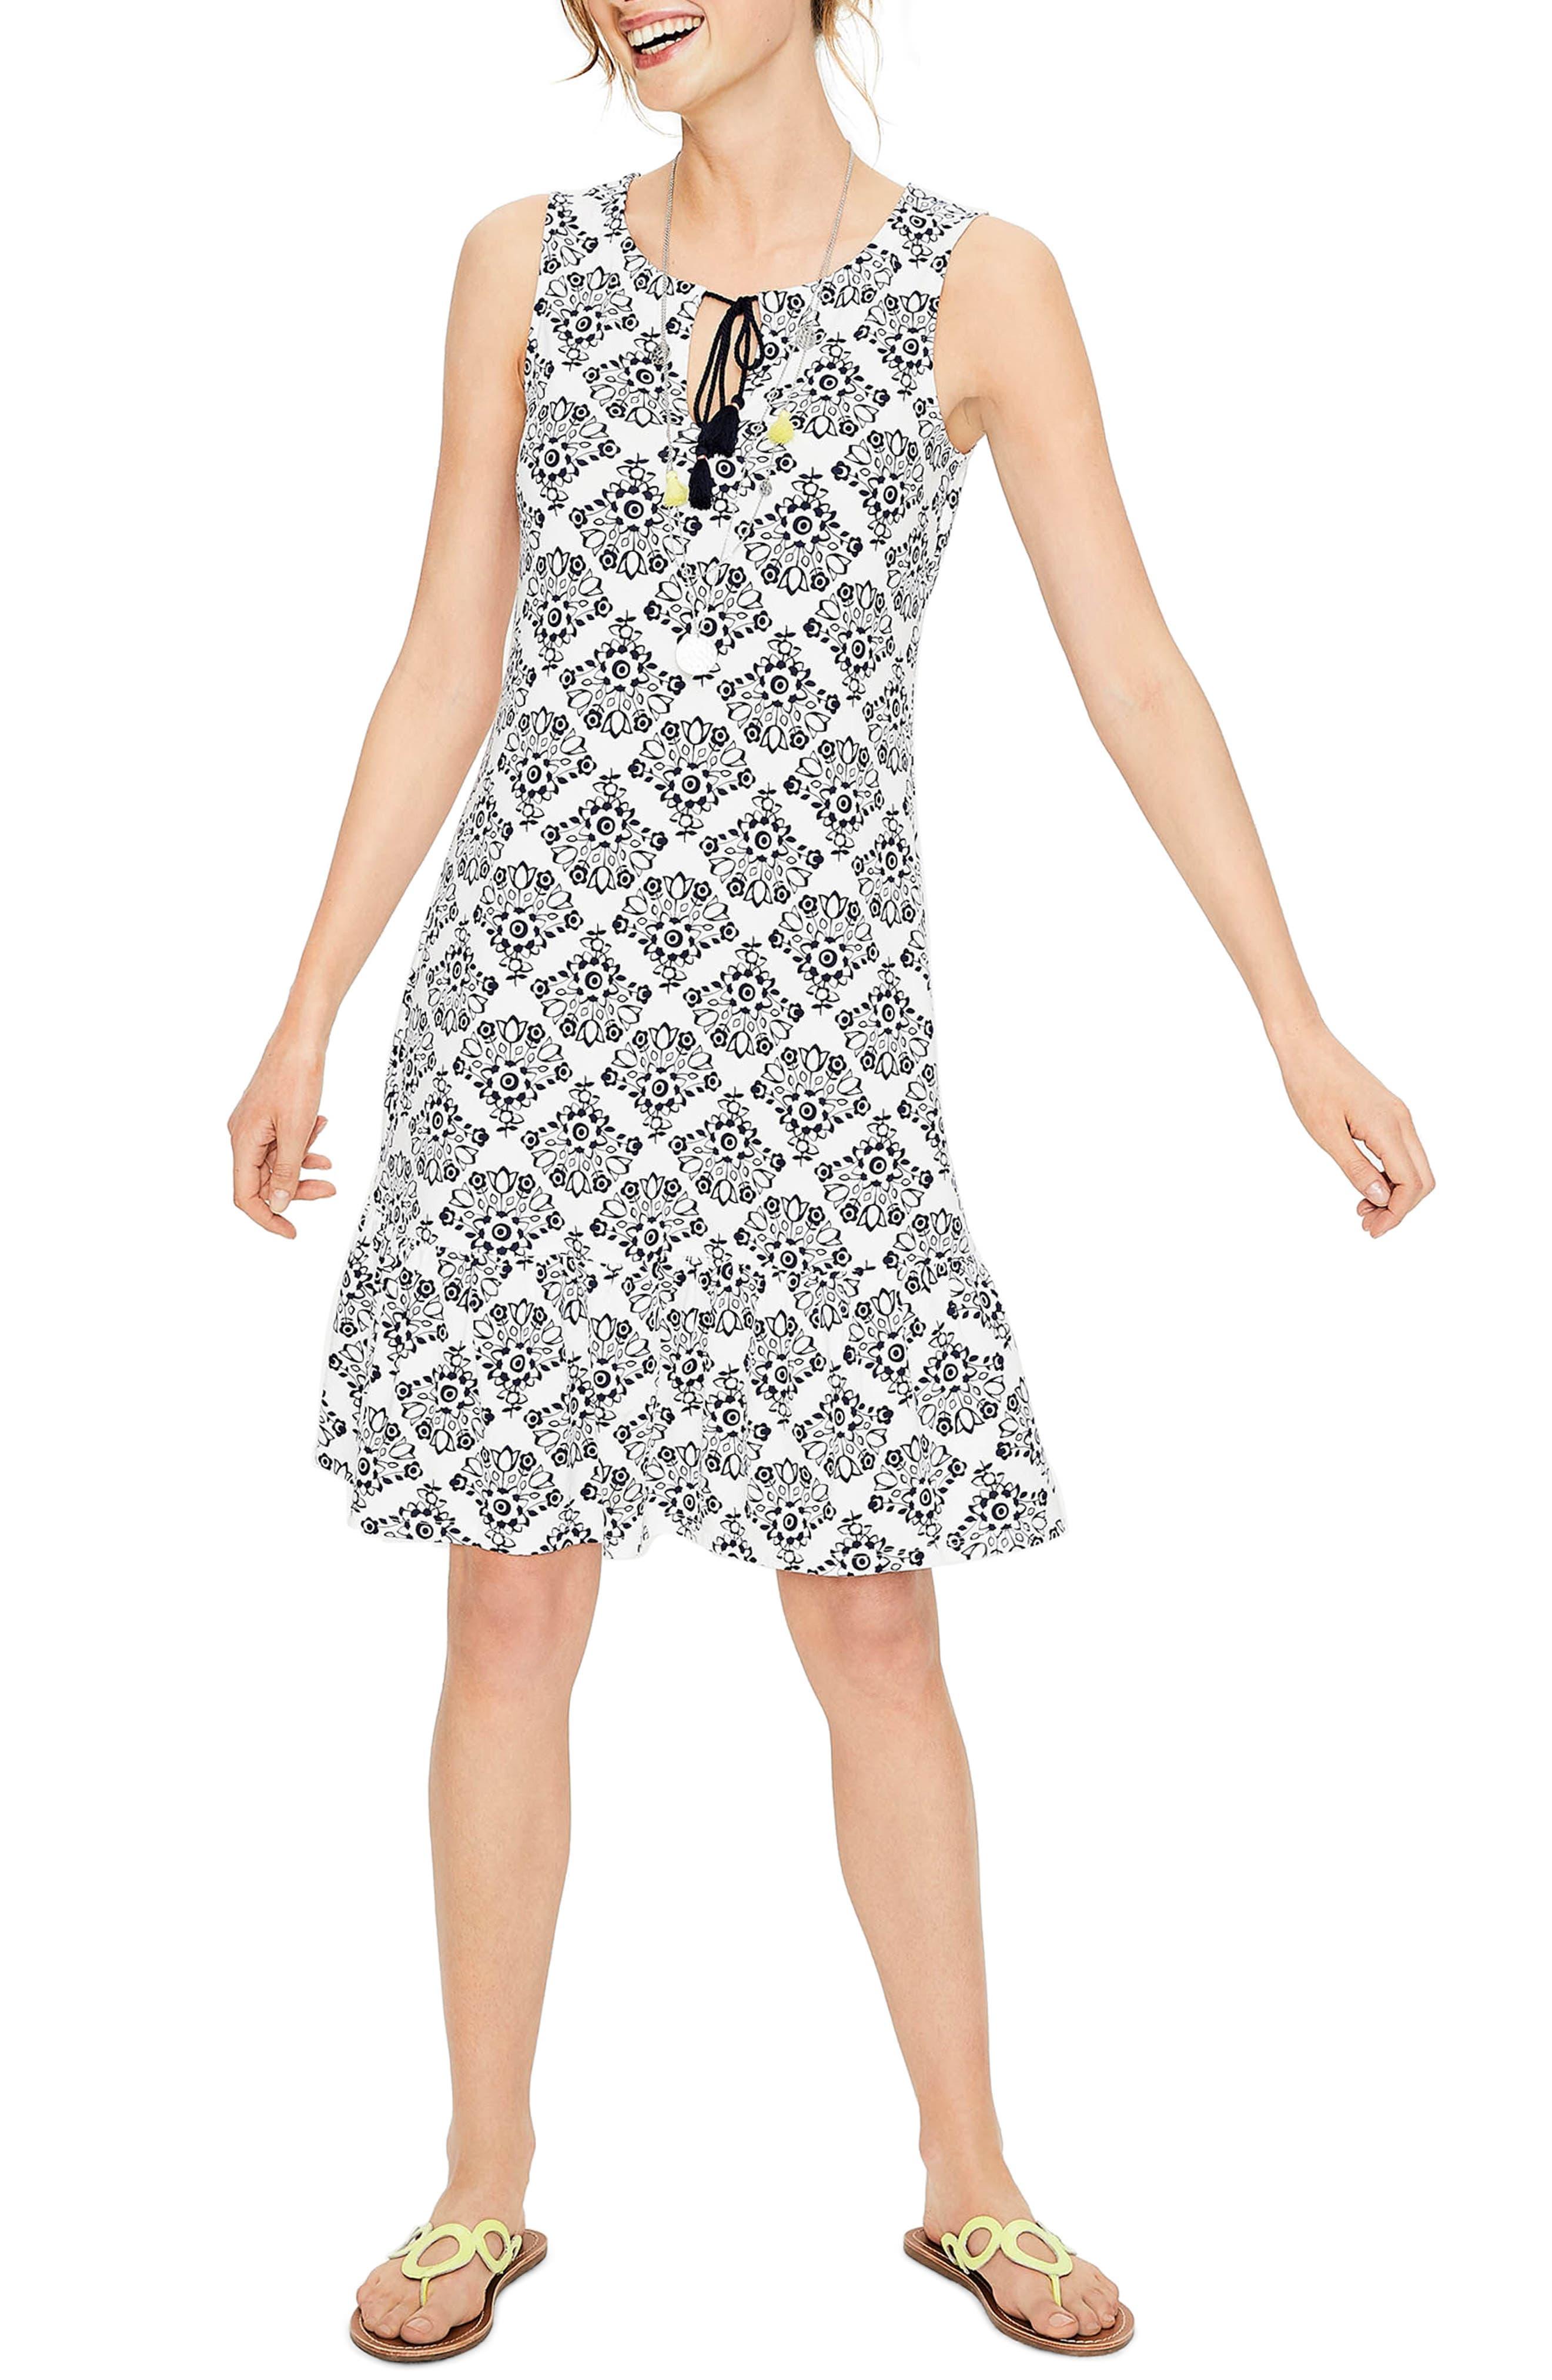 Tassel Tie Print Tank Dress,                         Main,                         color, Ivory/Navy Floral Bo